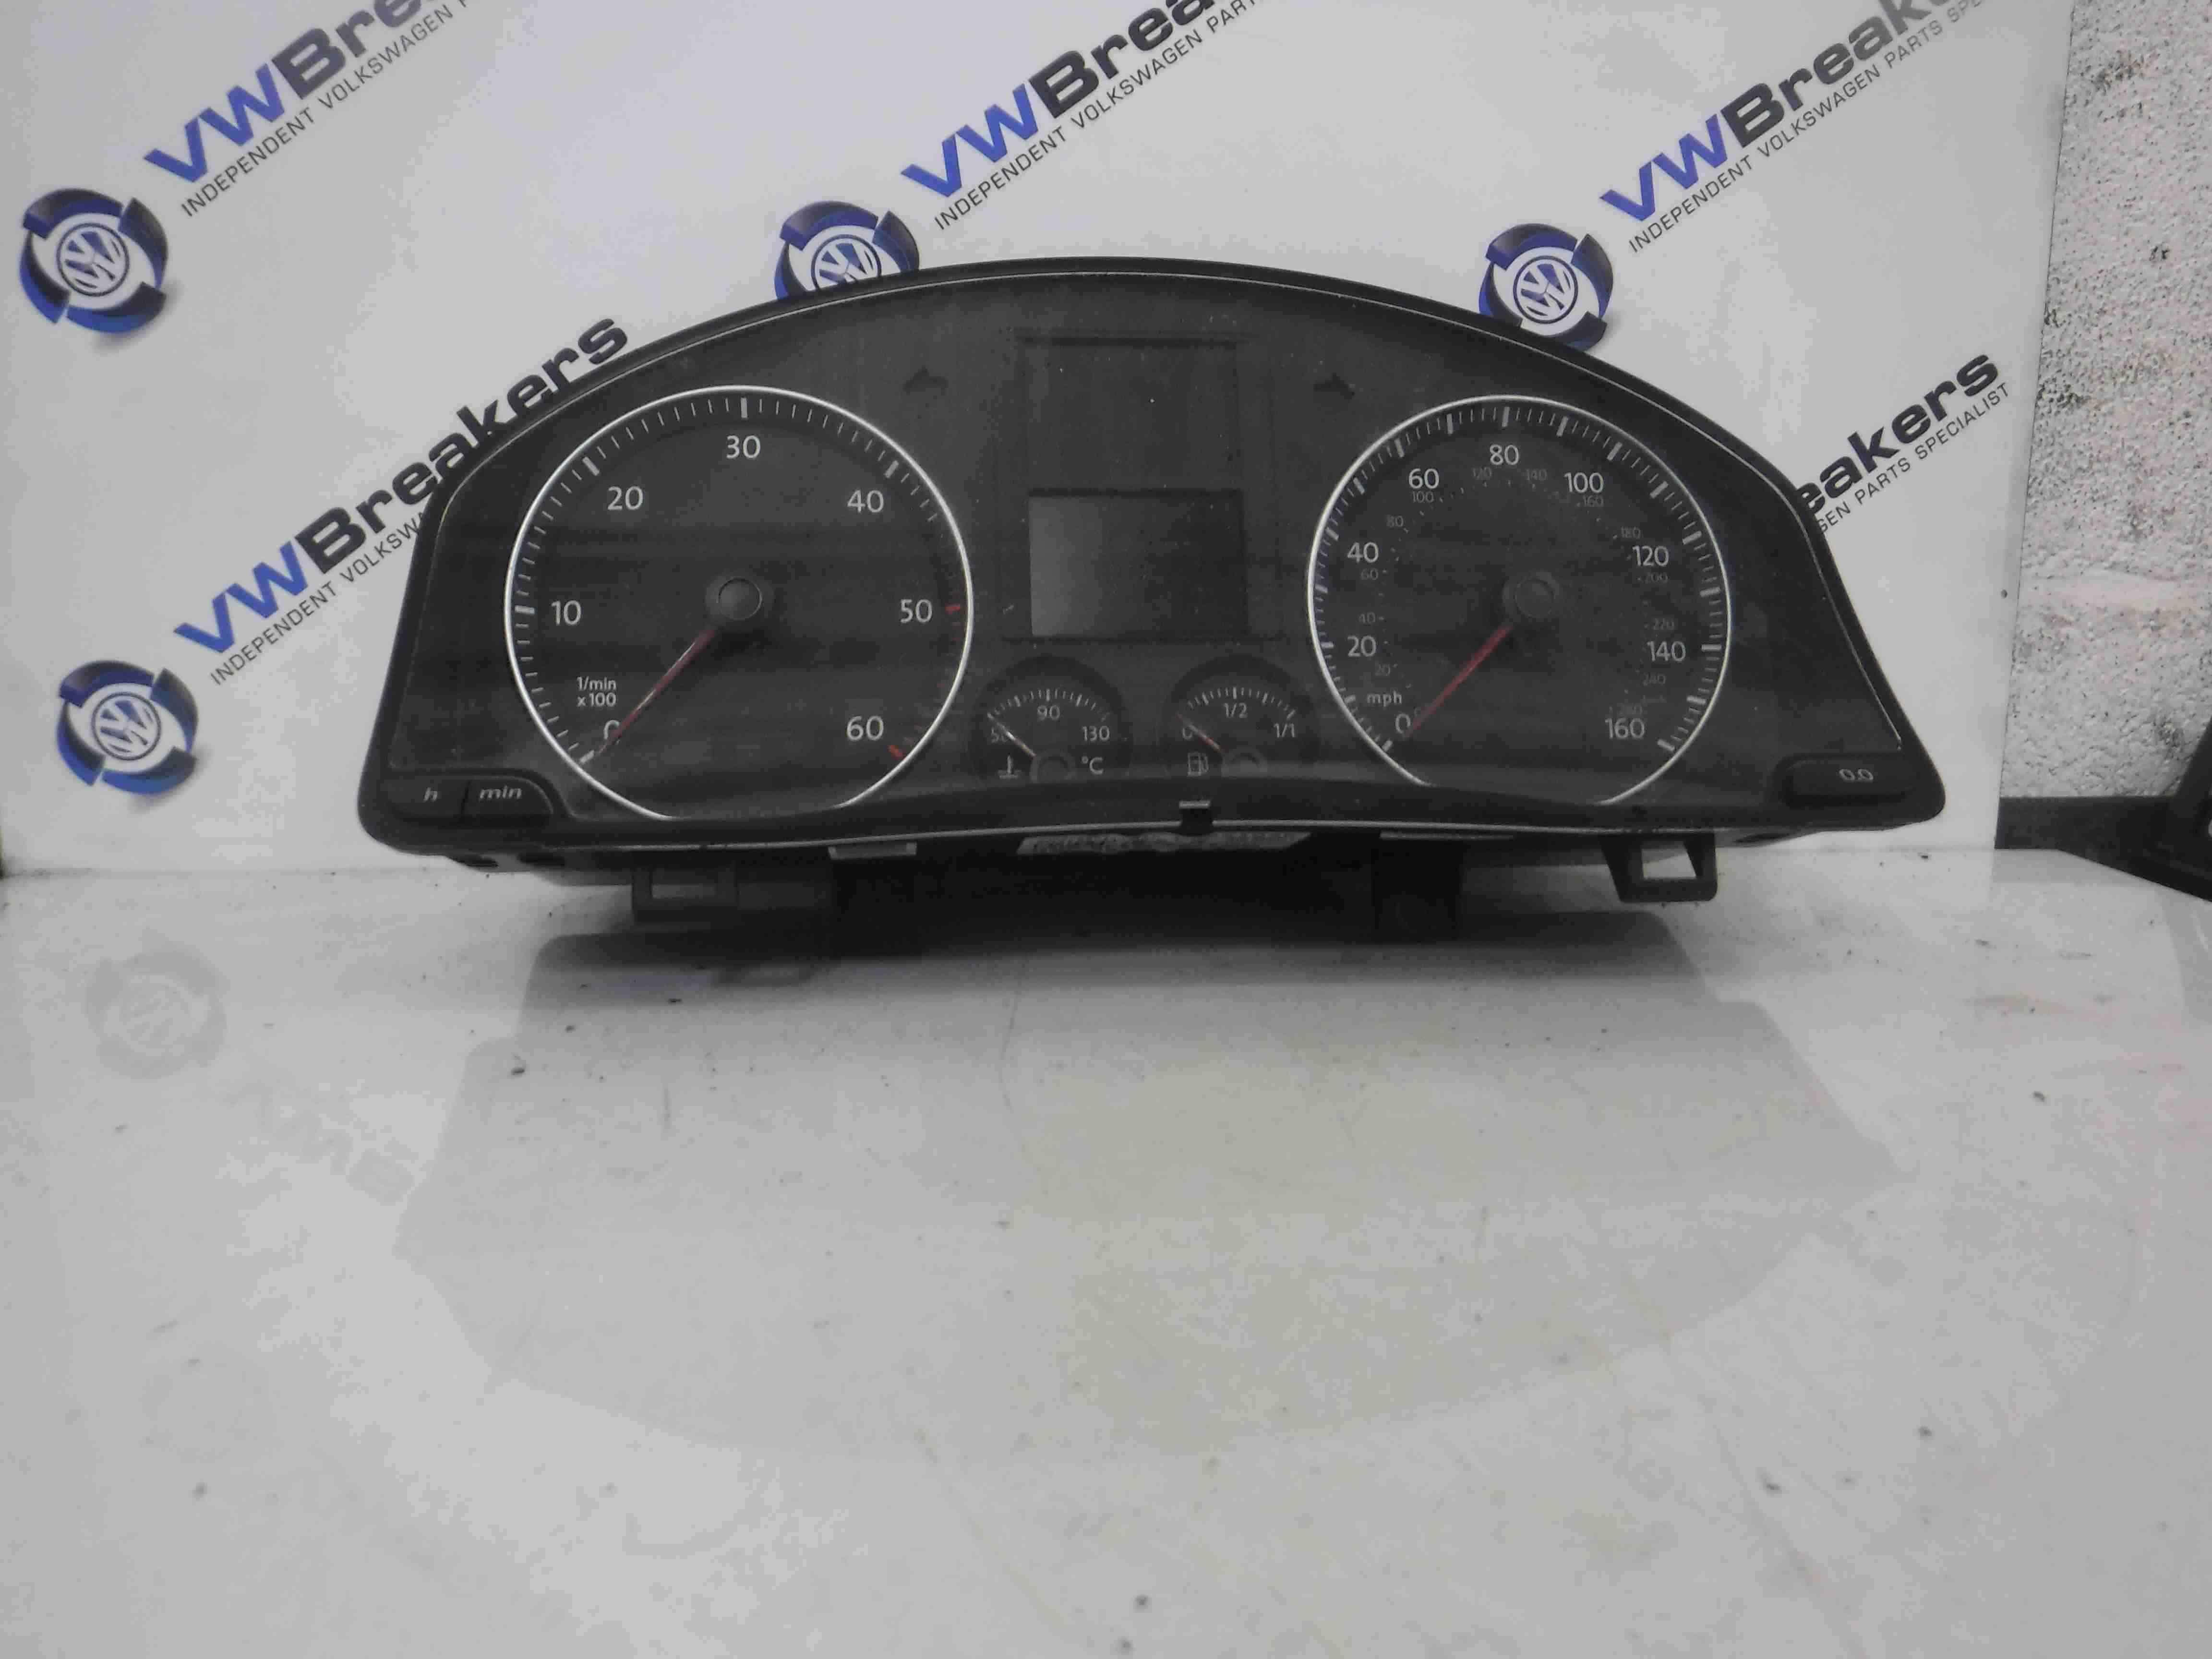 Volkswagen Golf MK5 2003-2009 Instrument Panel Clocks Cluster Gauges 1K0920961B